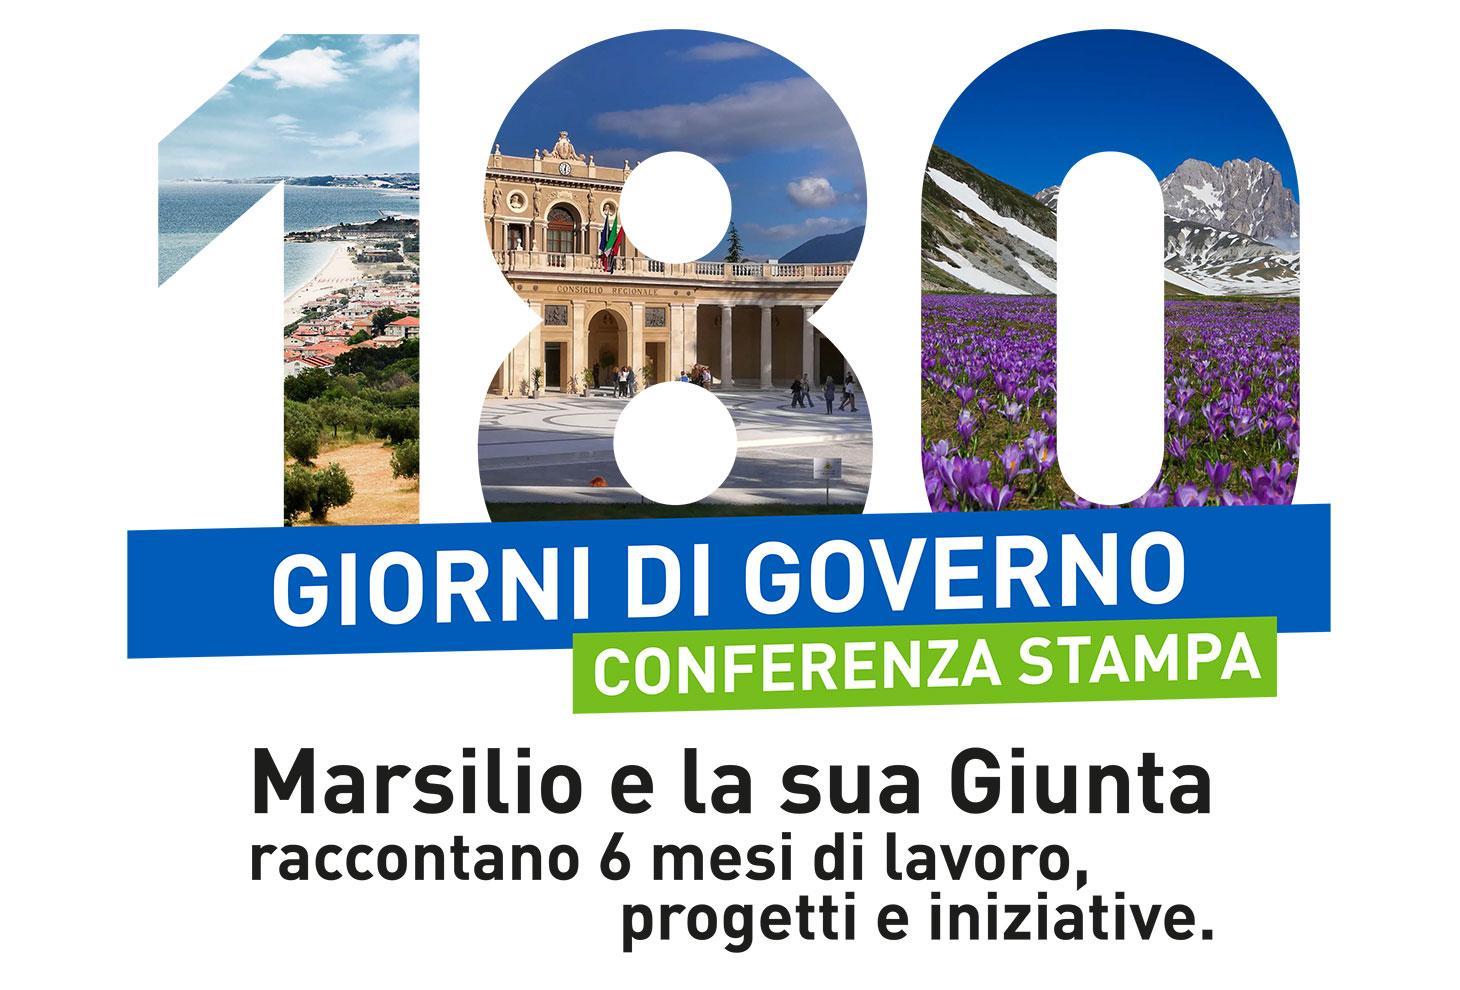 Manifesto conferenza stampa